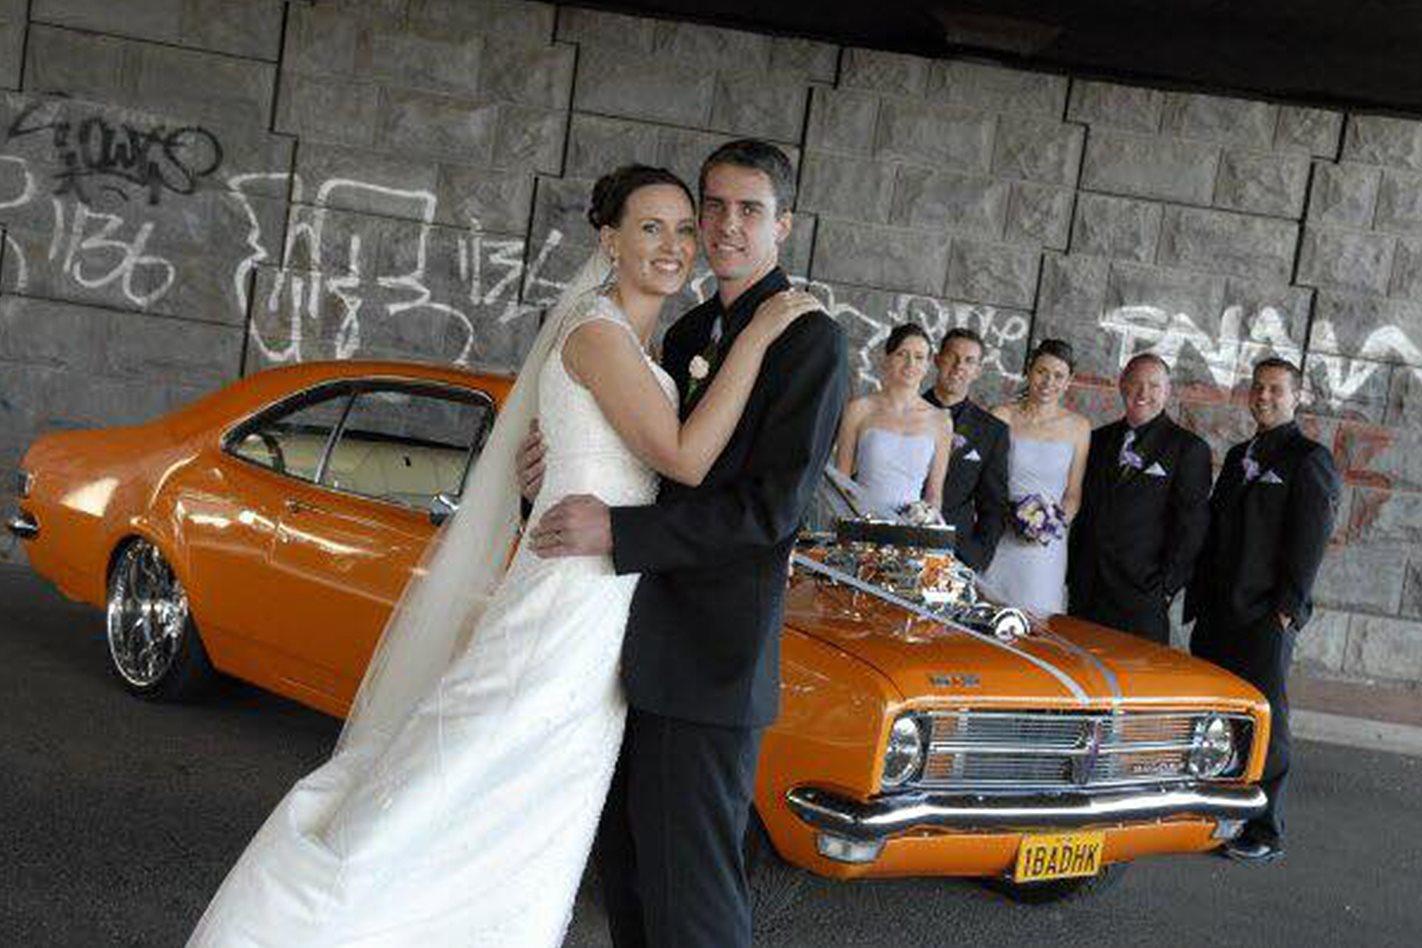 Scott Vickery's wedding car